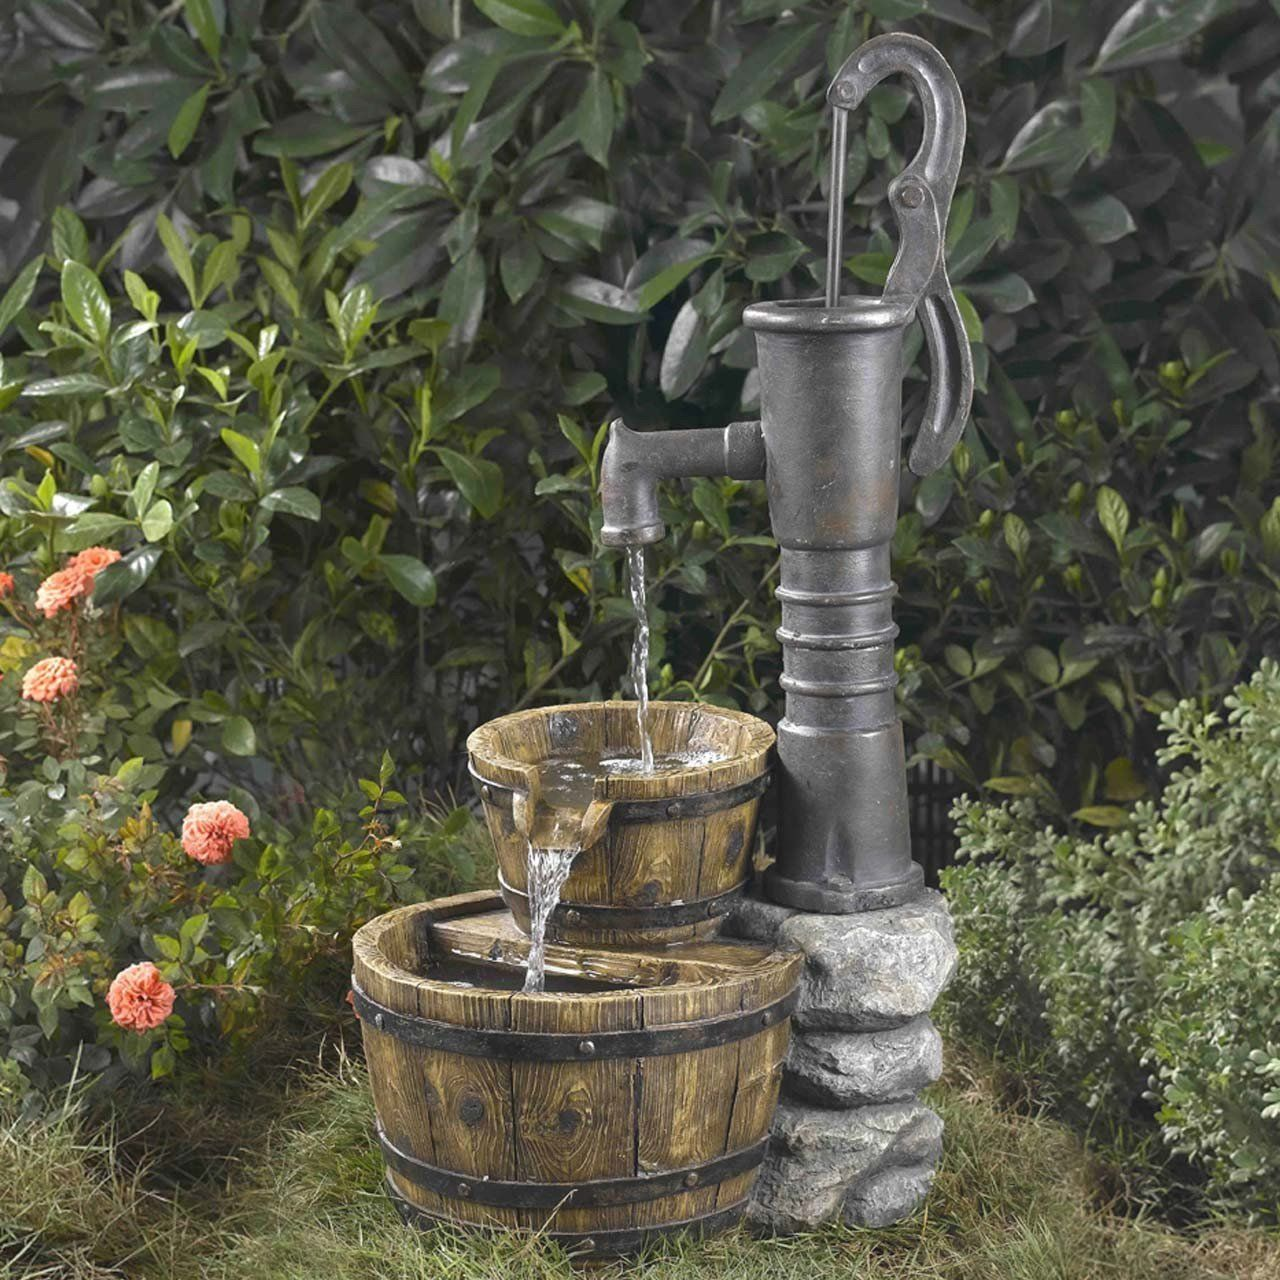 Beautiful Rustic Large Garden Deck Patio Water Pump Buckets Outdoor Fountain Looks Like Old Hand Pu Garden Water Fountains Water Fountain Fountains Outdoor